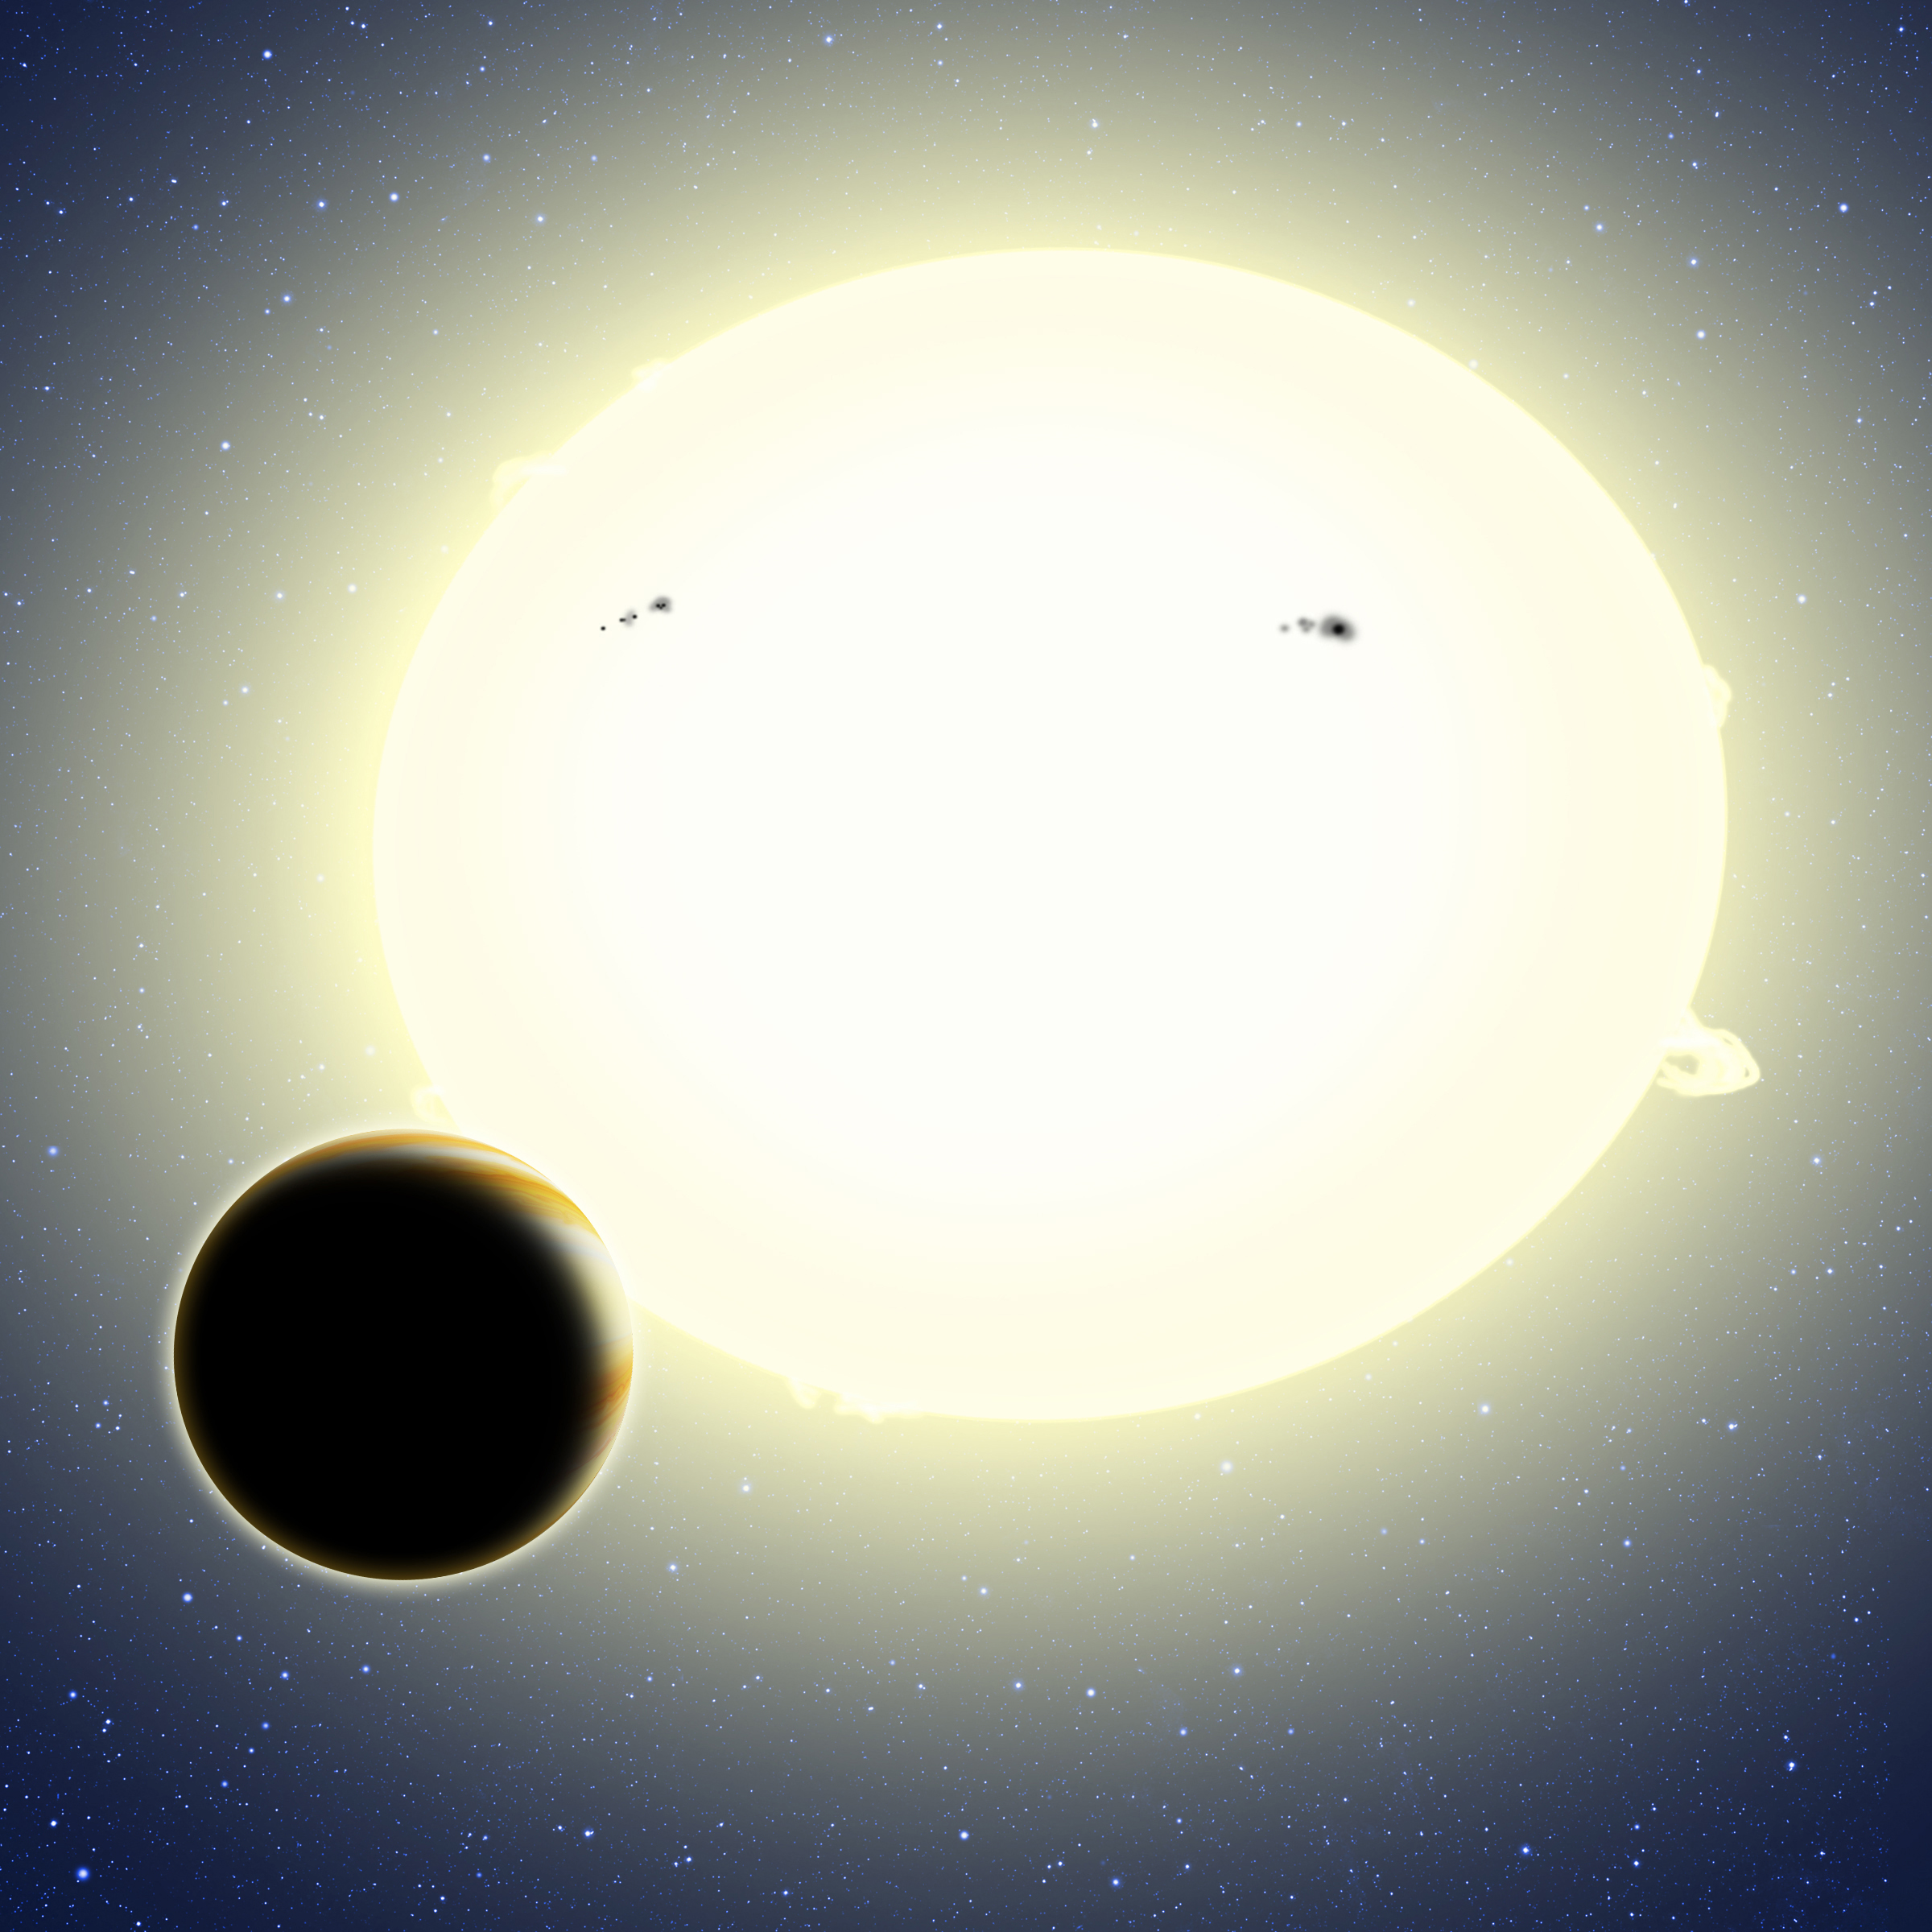 NASA's Kepler Spacecraft Finds 1st Alien Planet of New Mission